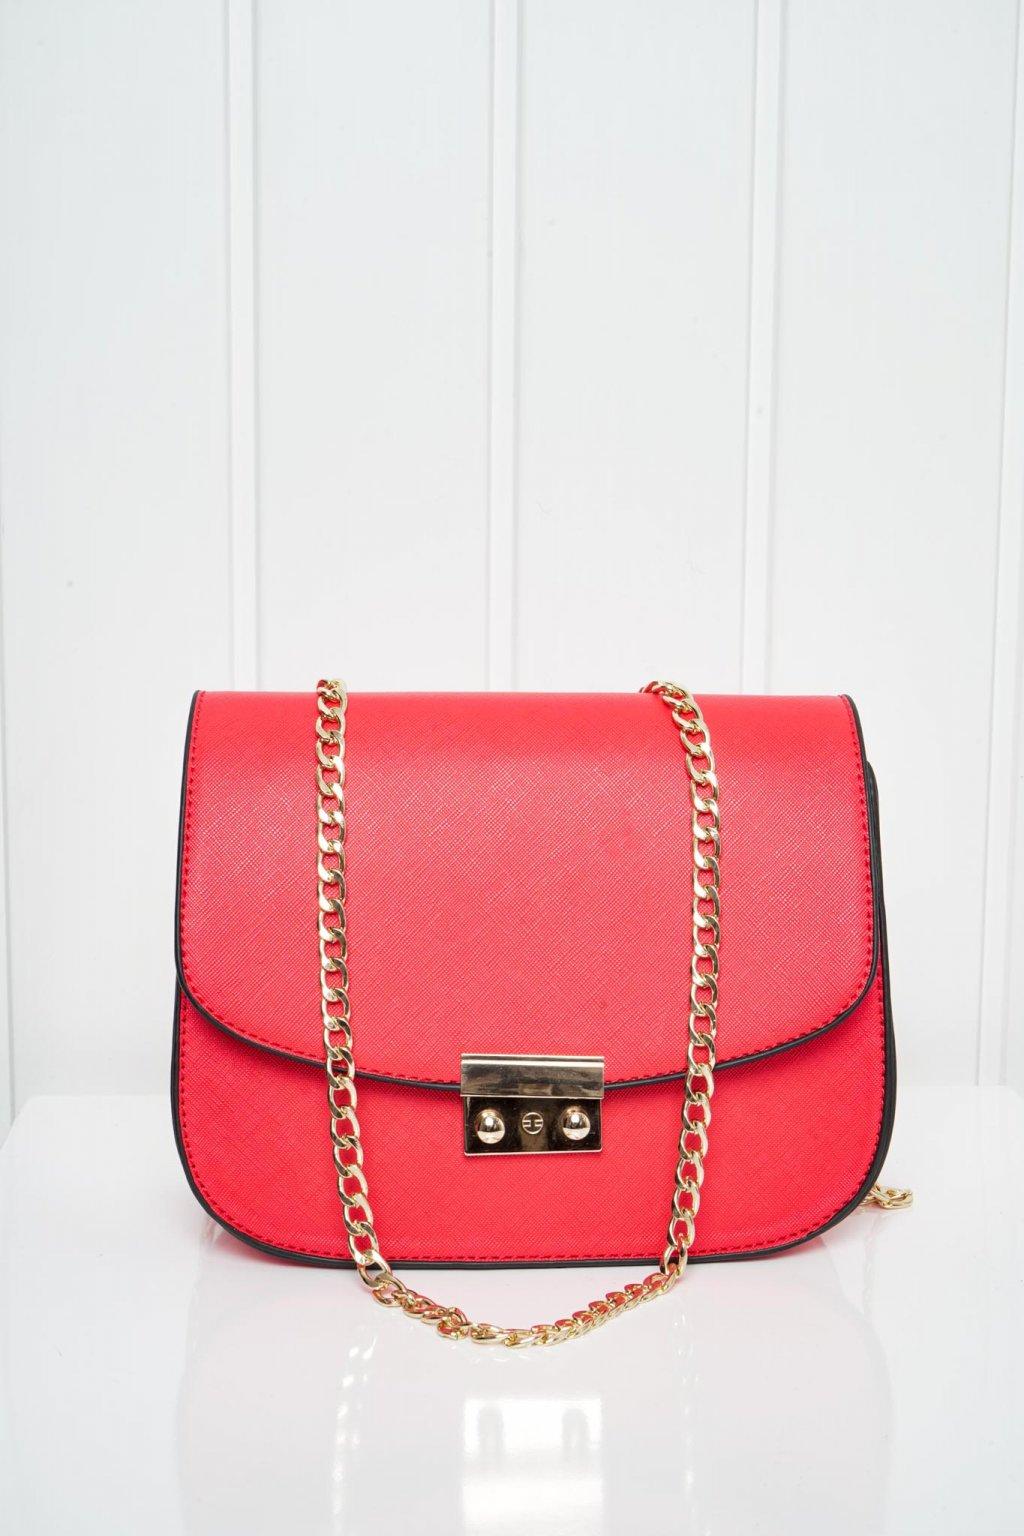 Kabelka, crossbody, ruksak, shopping bag, shopperka, 489